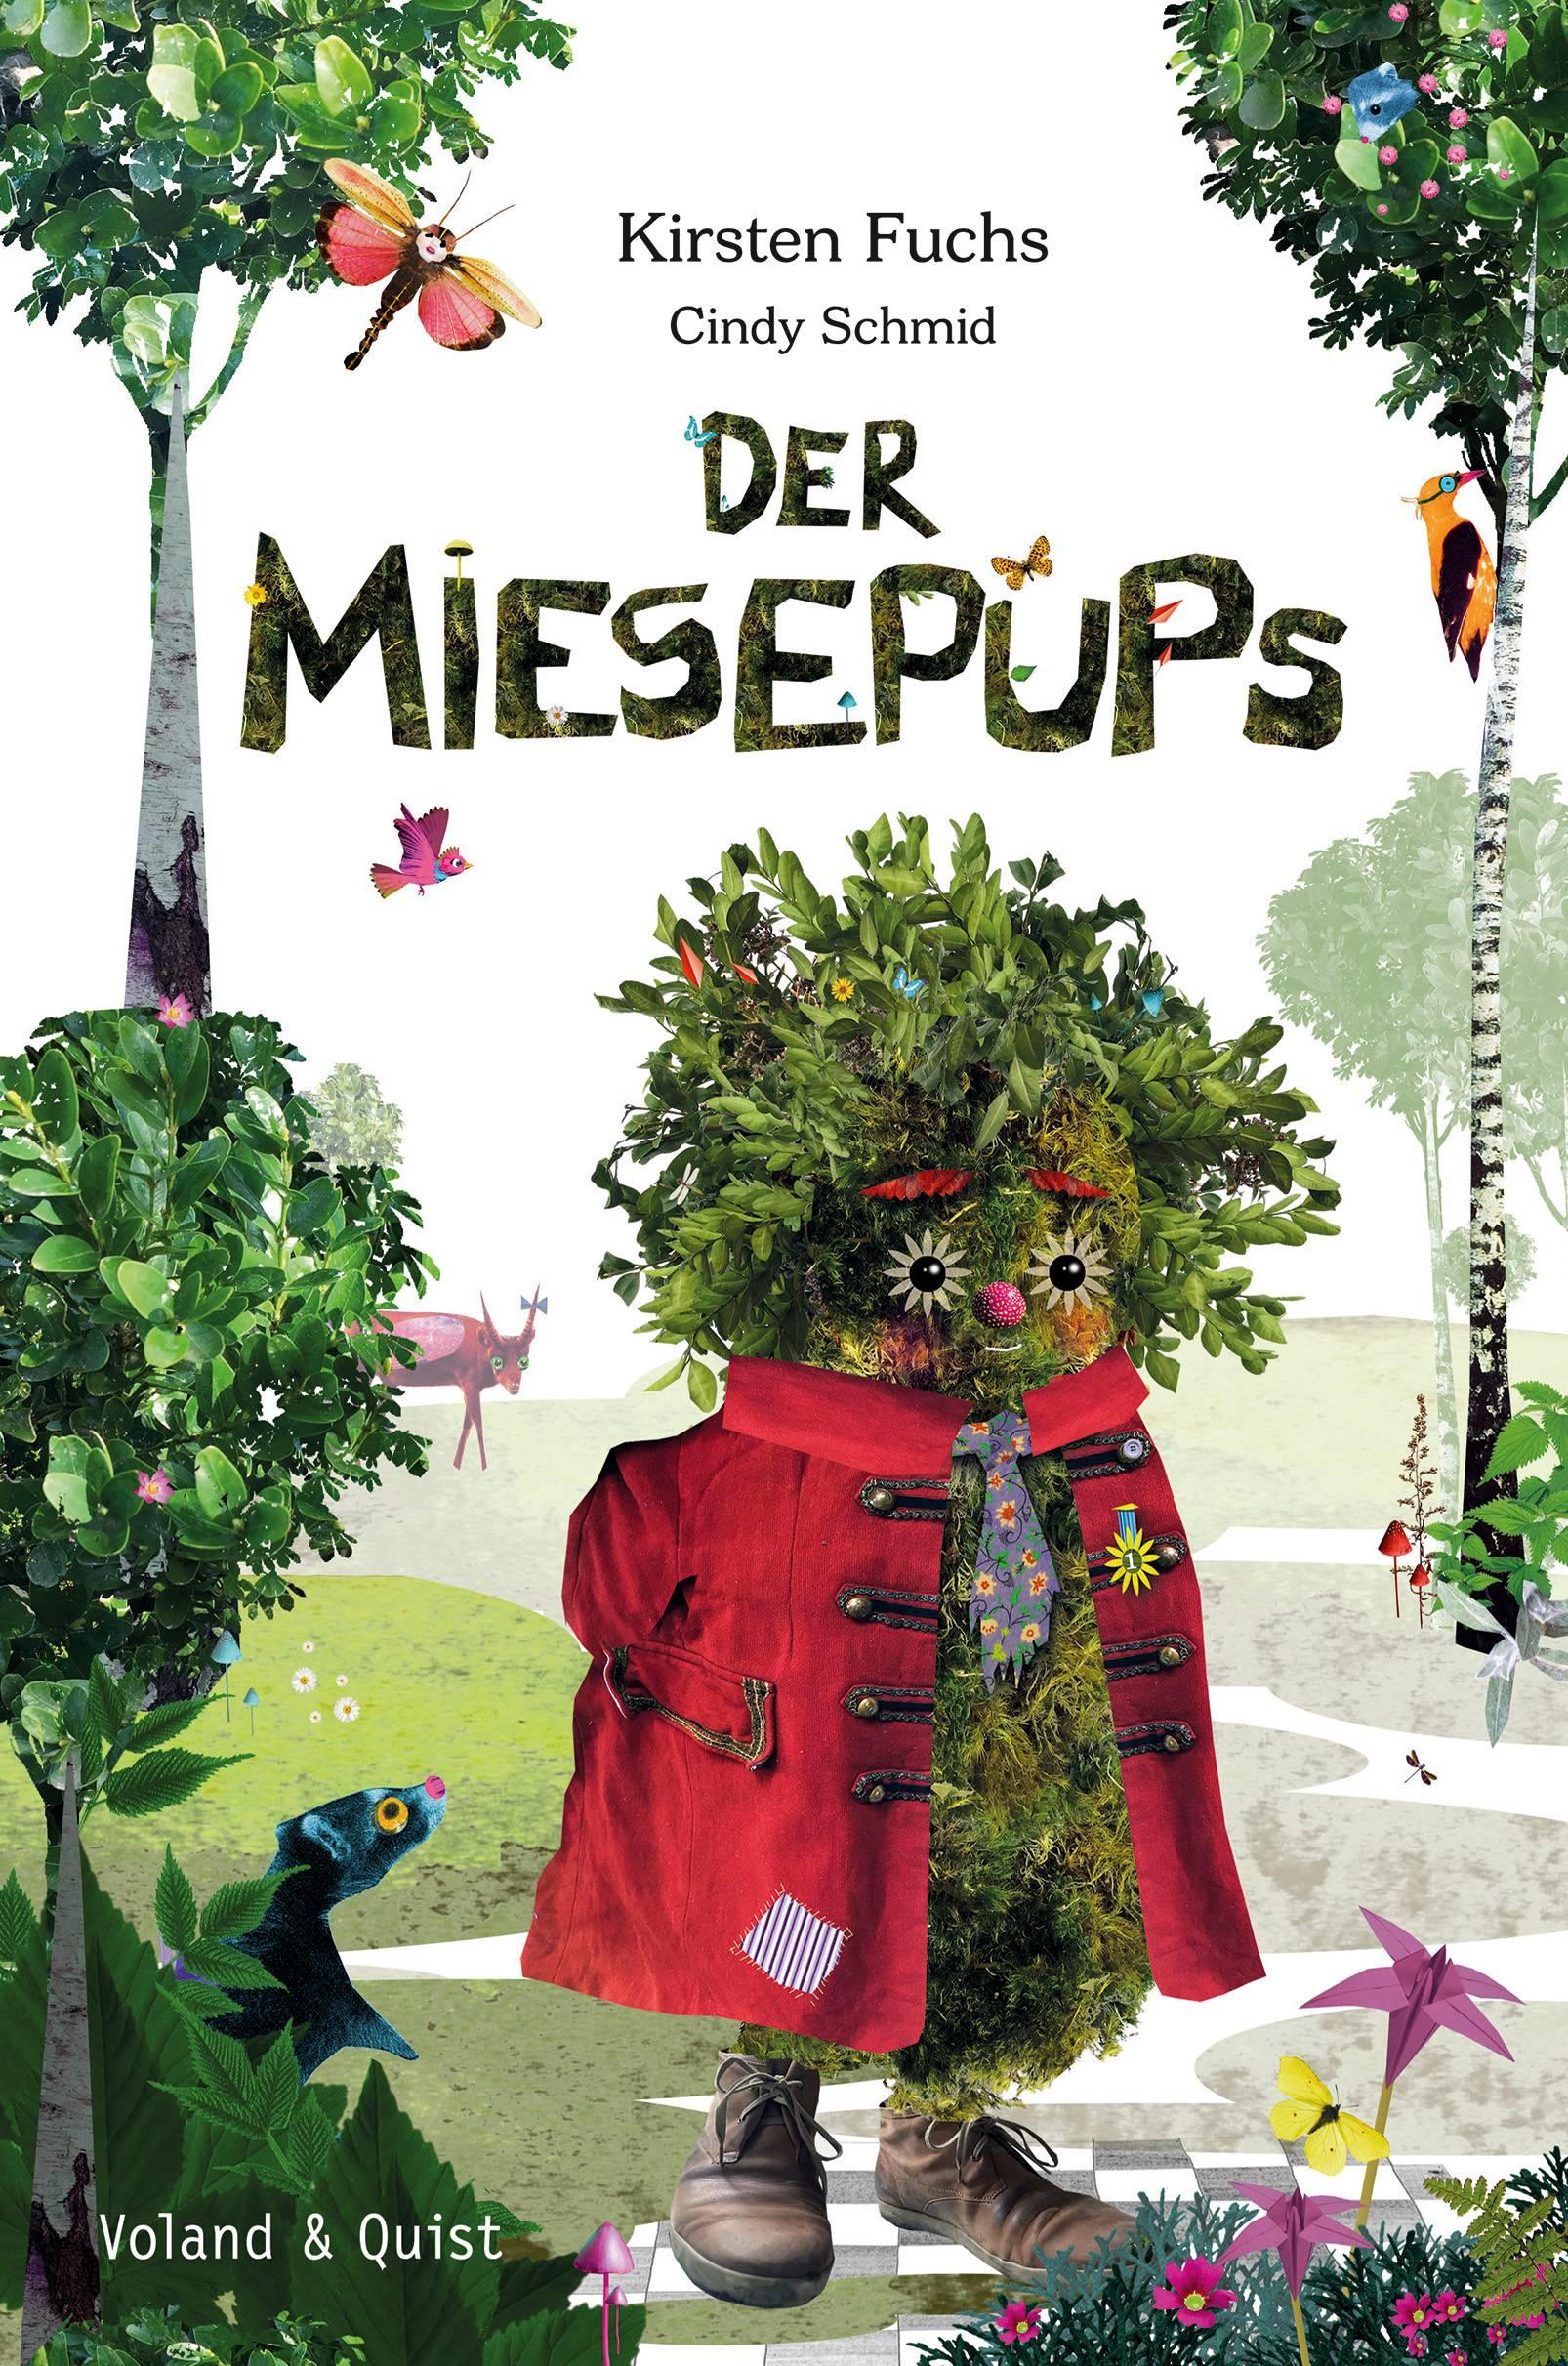 (Foto: Verlag Voland & Quist)